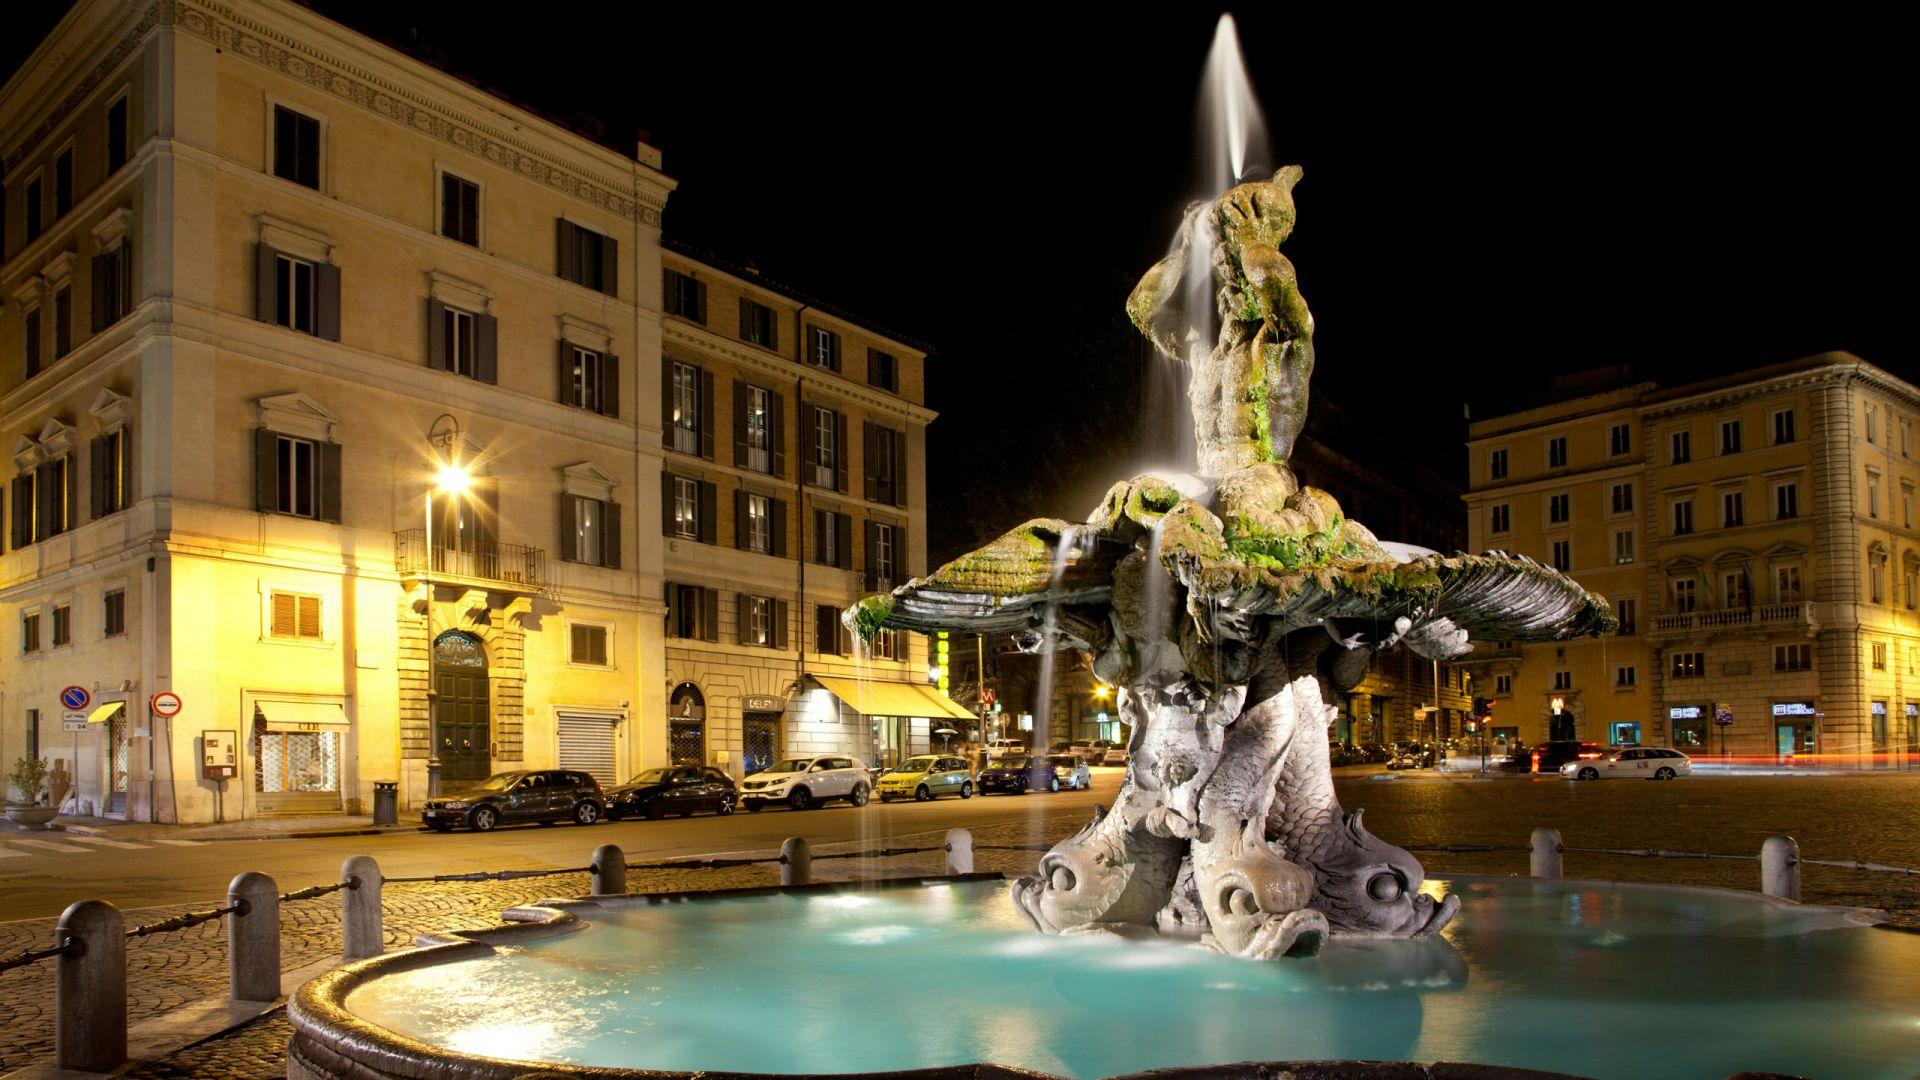 albergo-ottocento-rome-externe-04